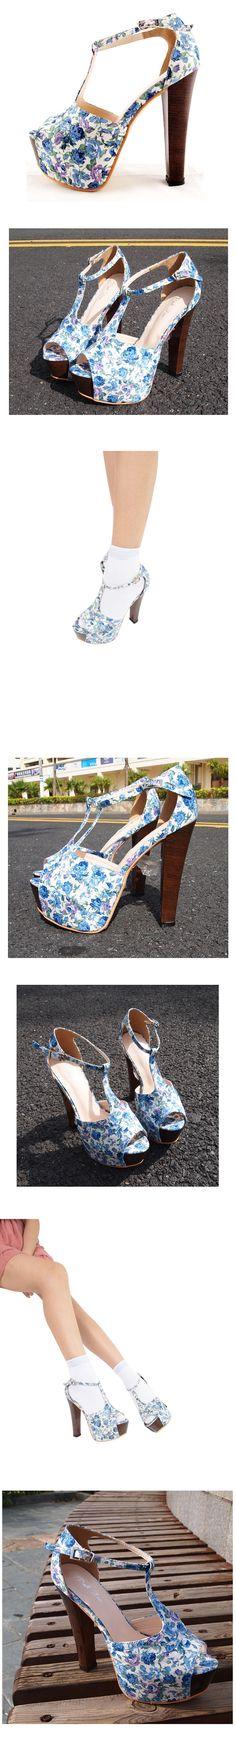 #Udobuy Blue Vintage Flower Pattern Cotton Chunky Heel Shoe$92